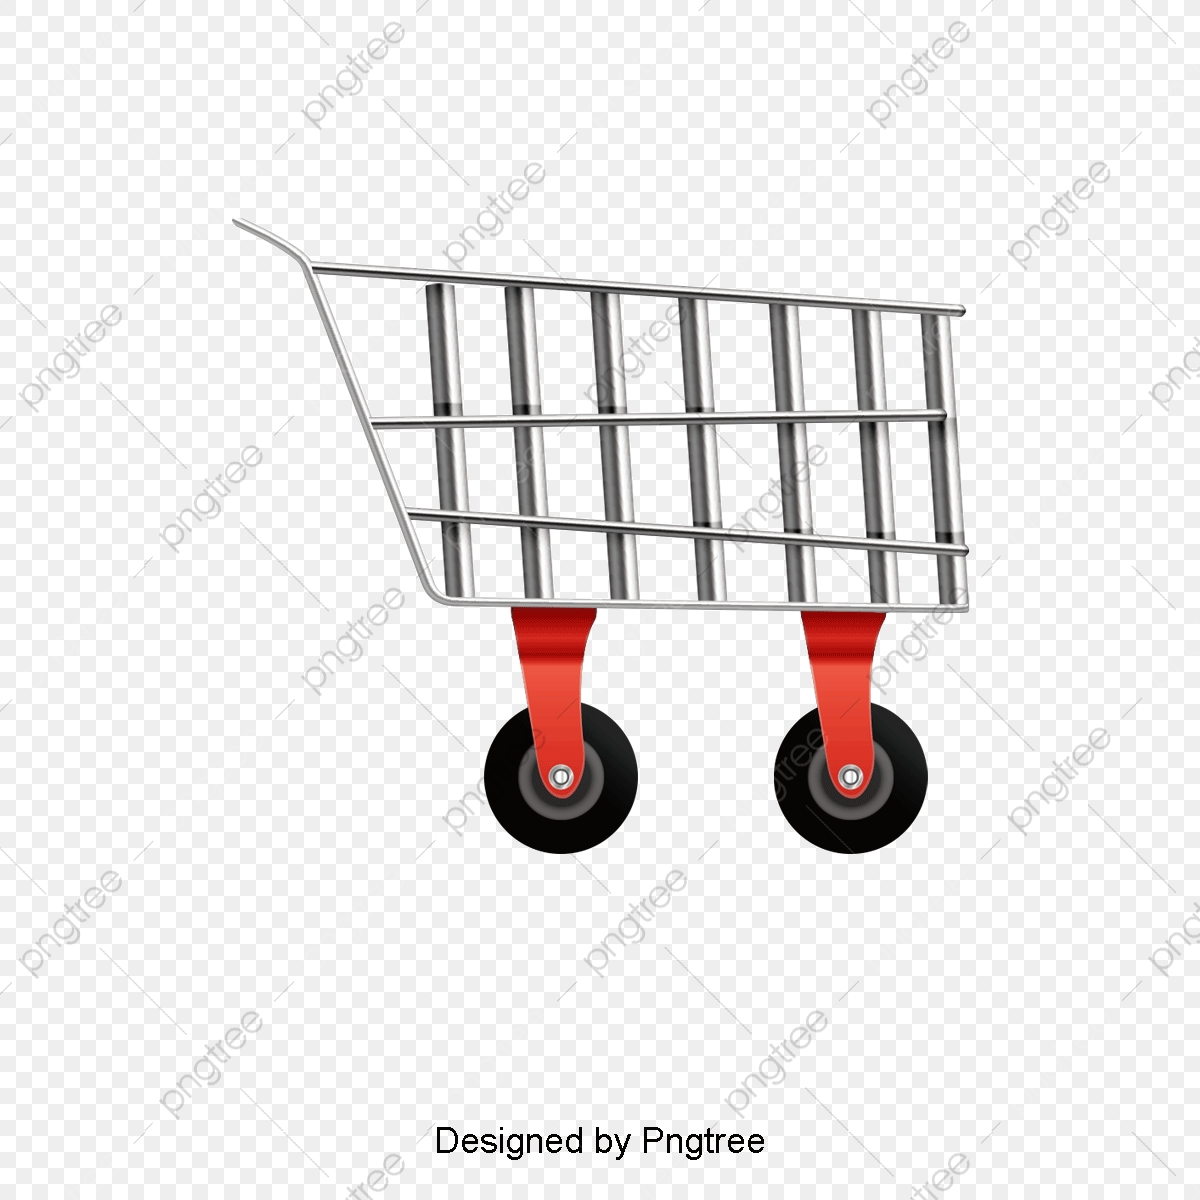 Shopping Cart Decorative Vector, Shopping Cart, Shopping Cart.